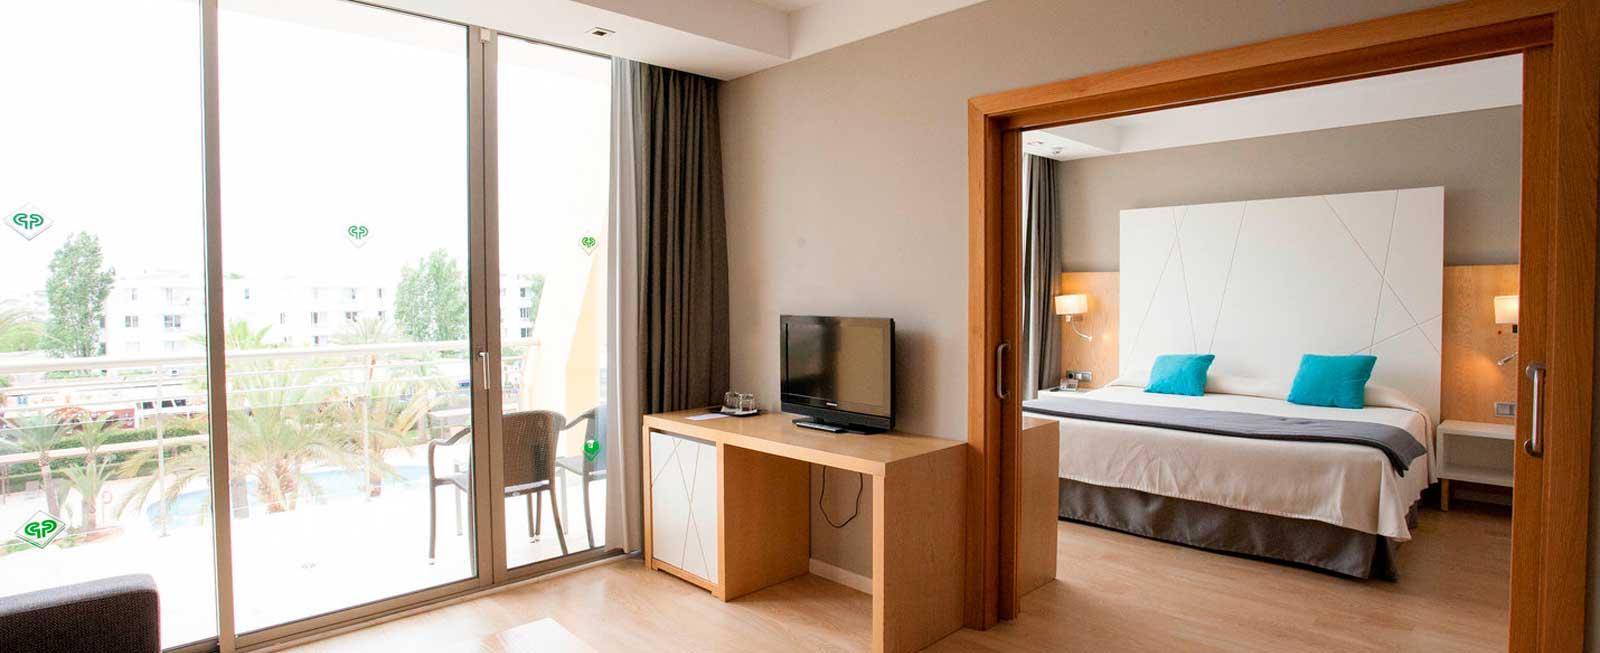 Suite Protur Sa Coma Playa Hotel